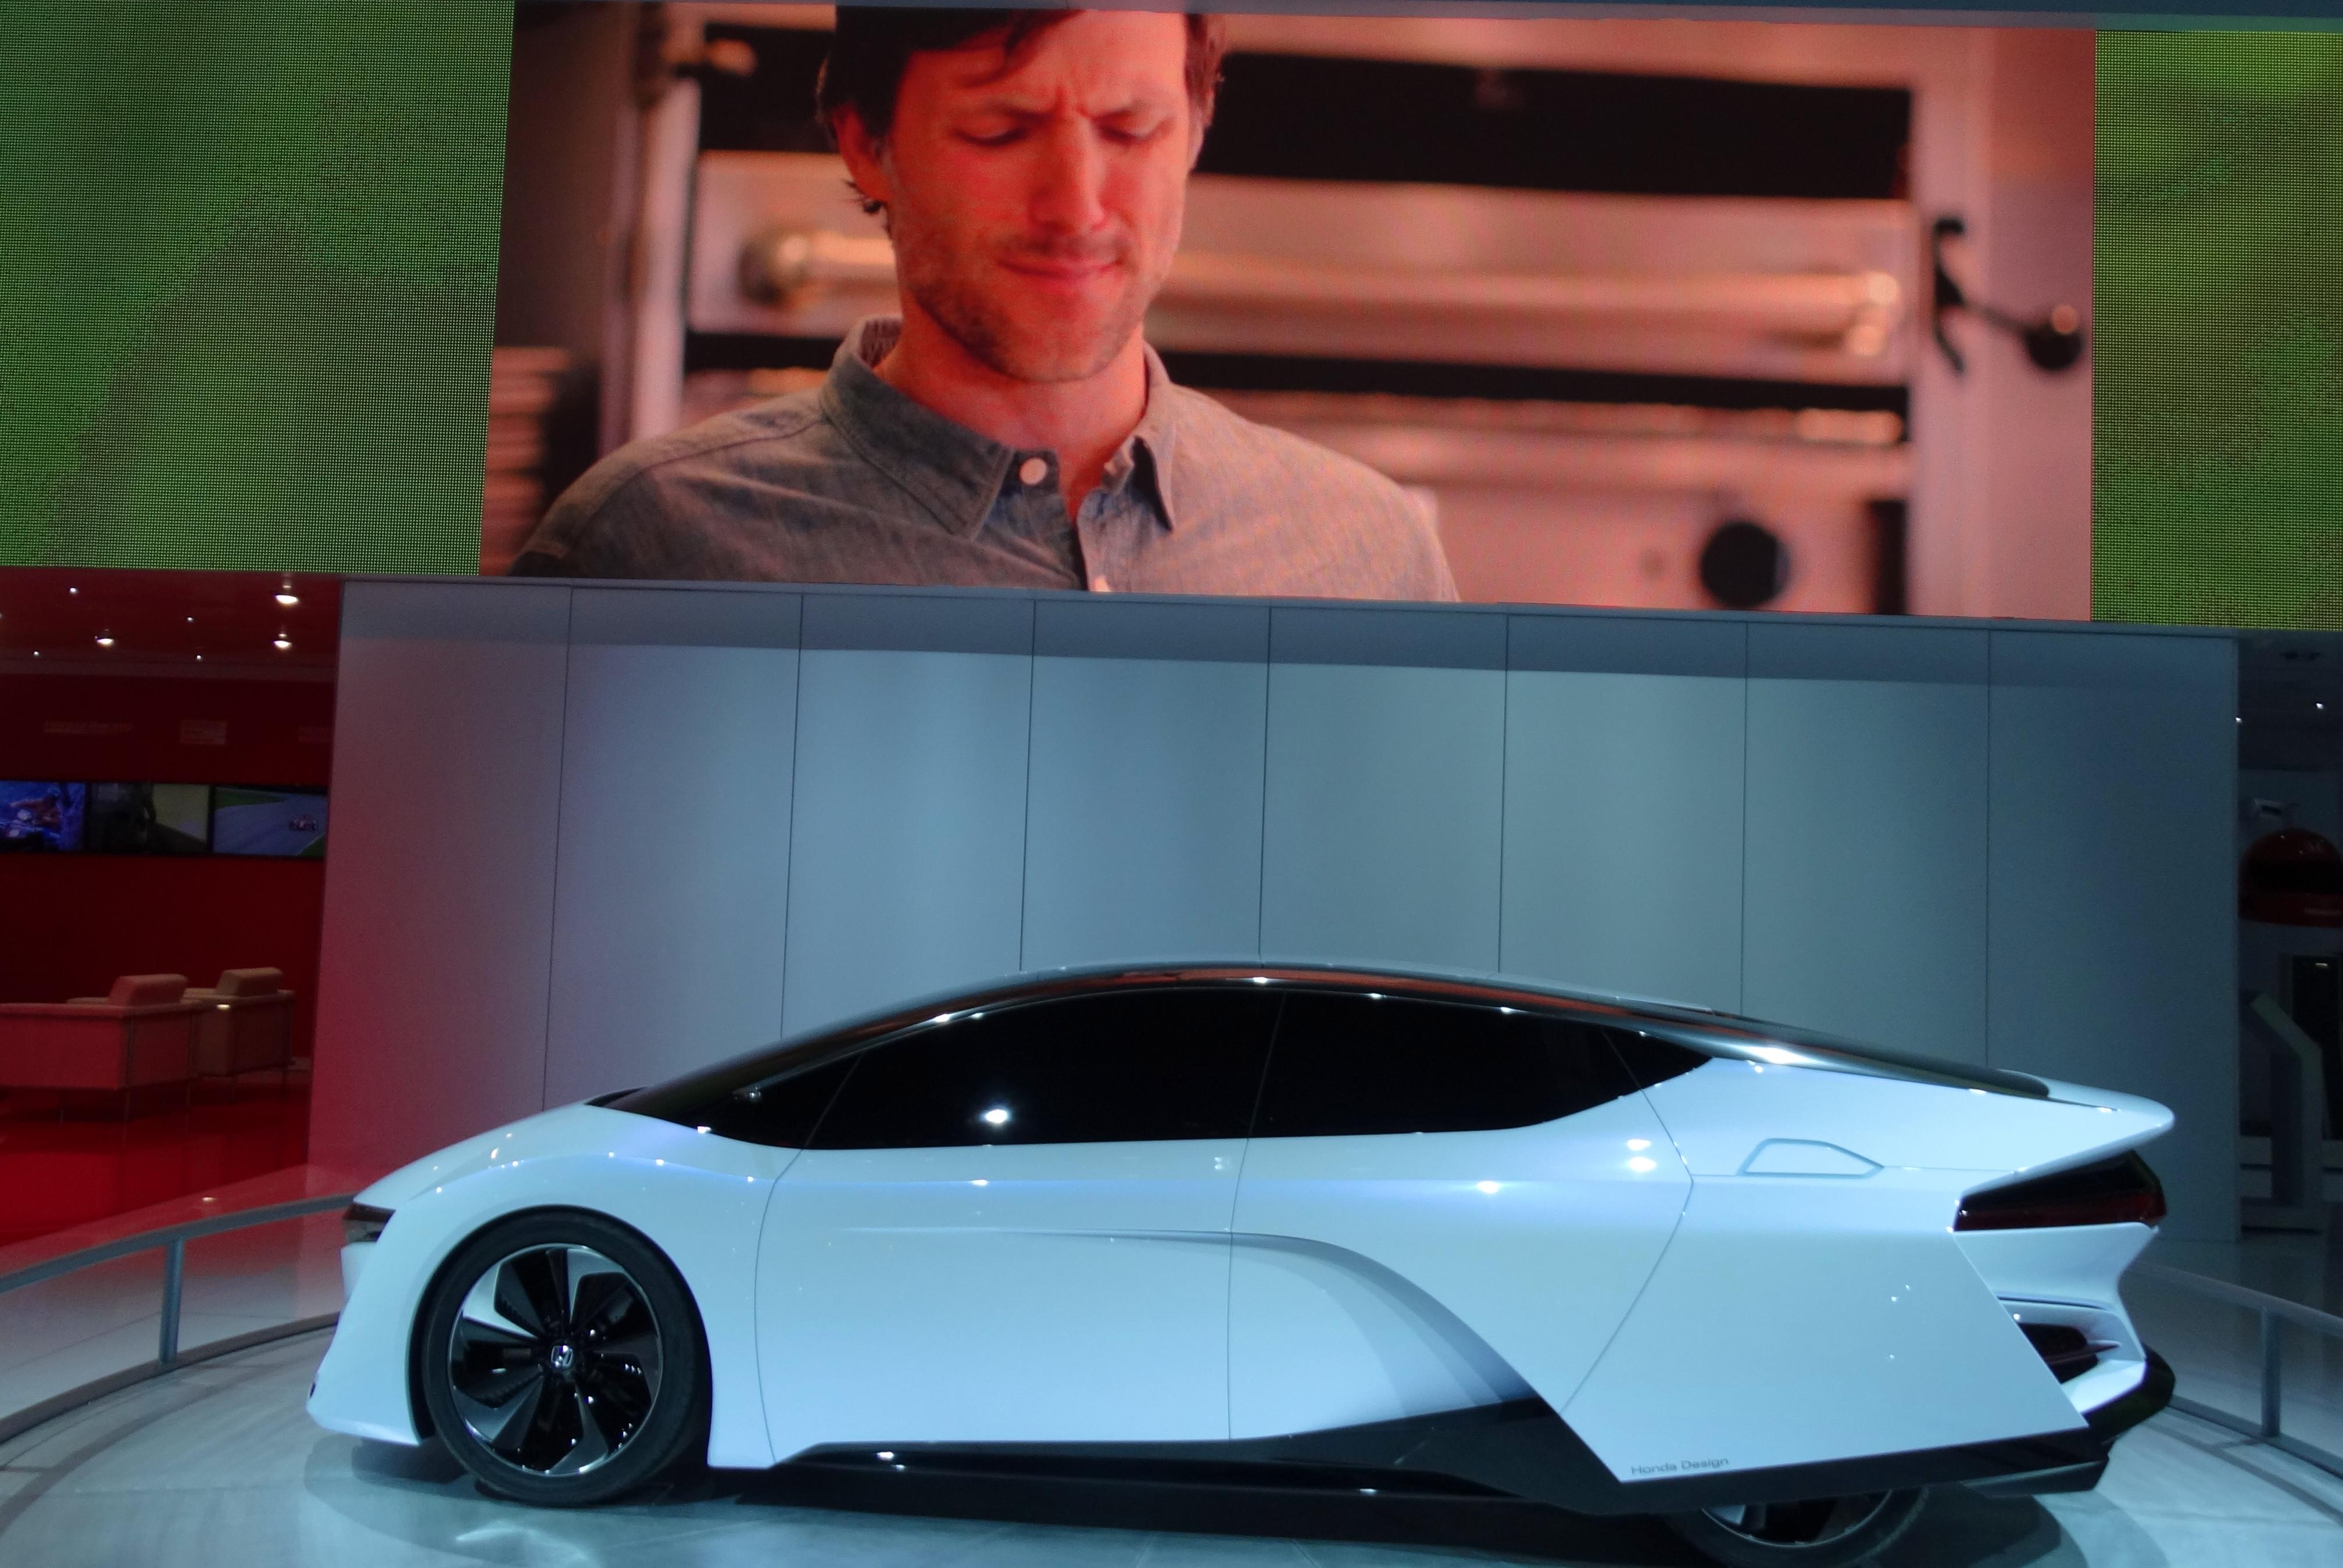 Major 2013 Auto Shows Worst Concept Cars